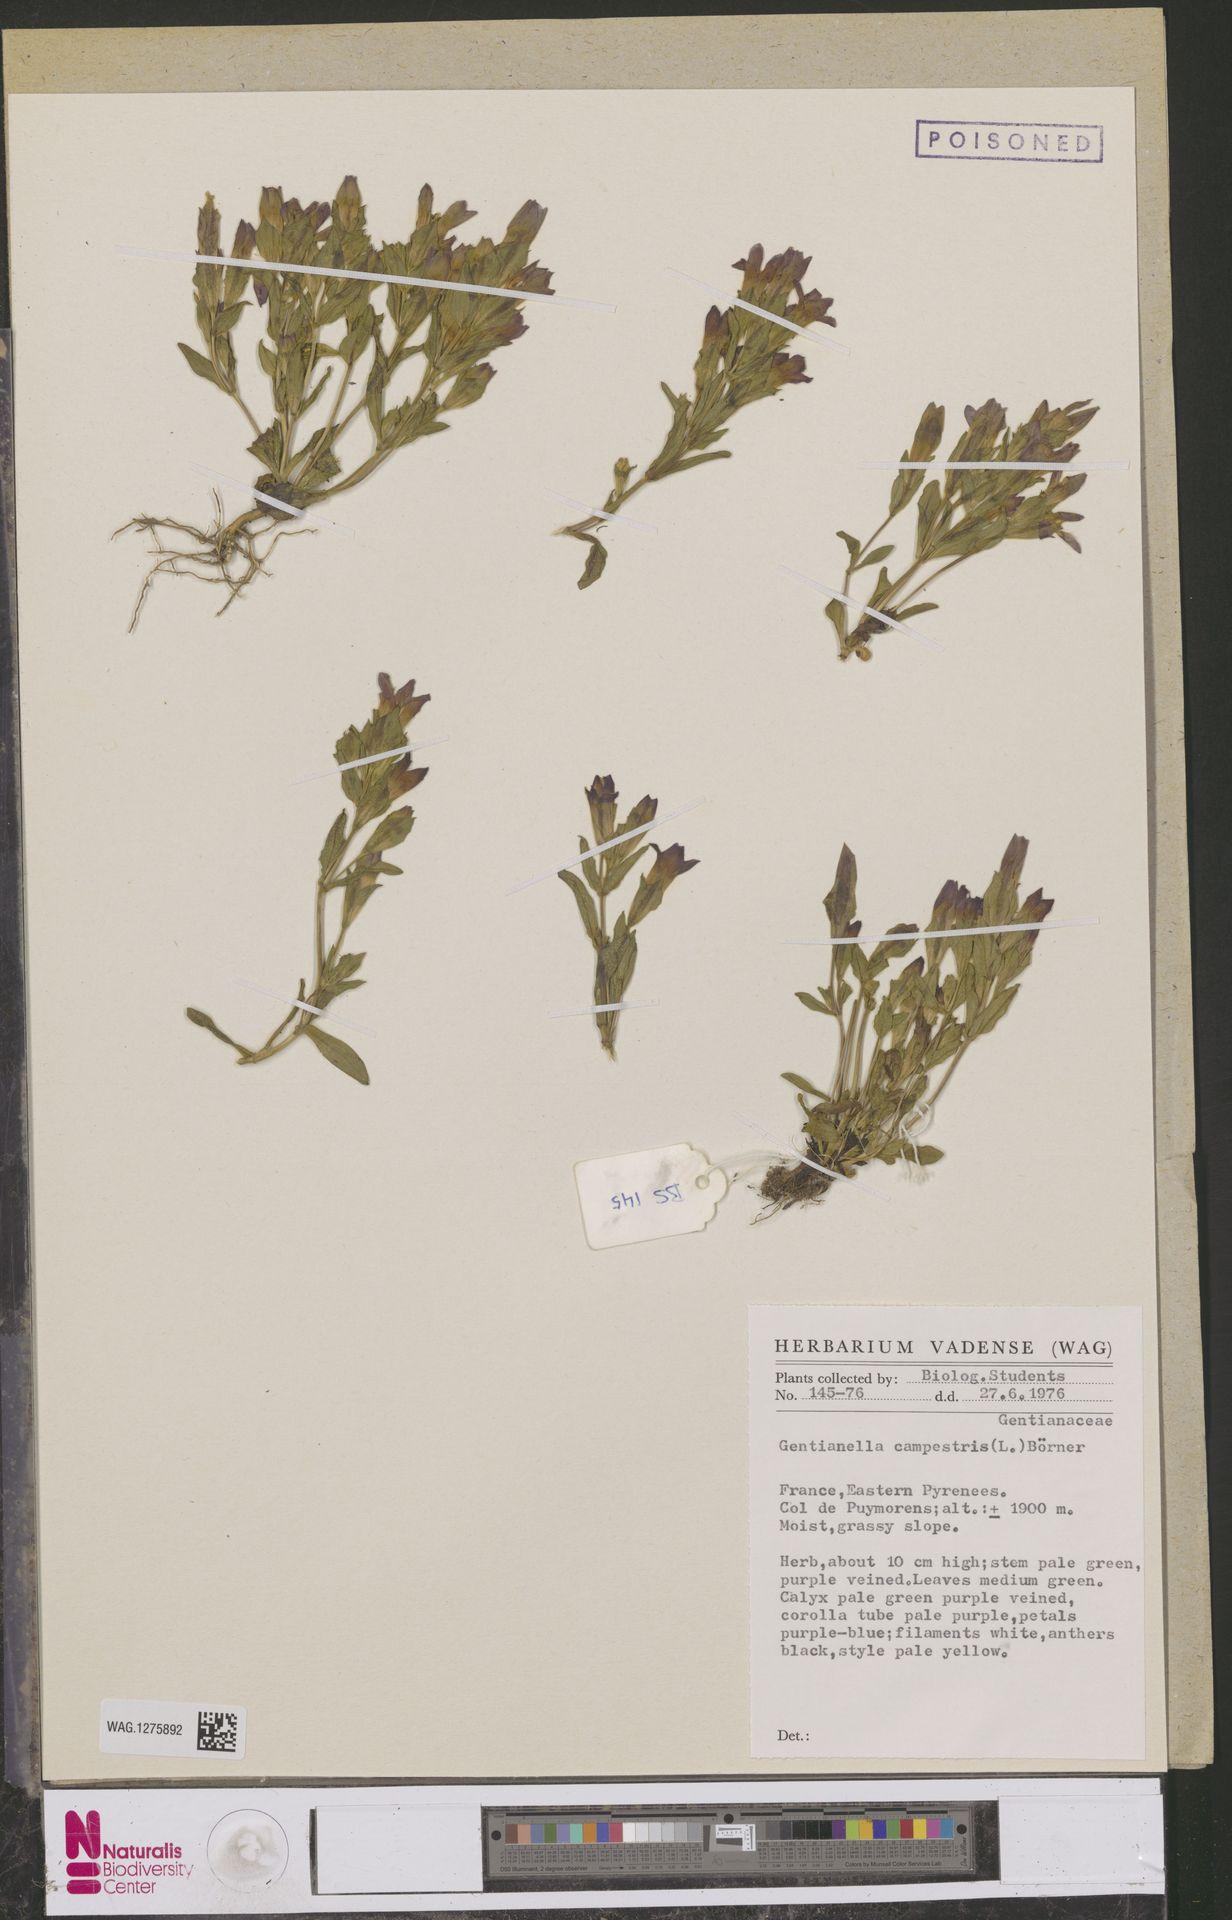 WAG.1275892   Gentianella campestris (L.) Börner